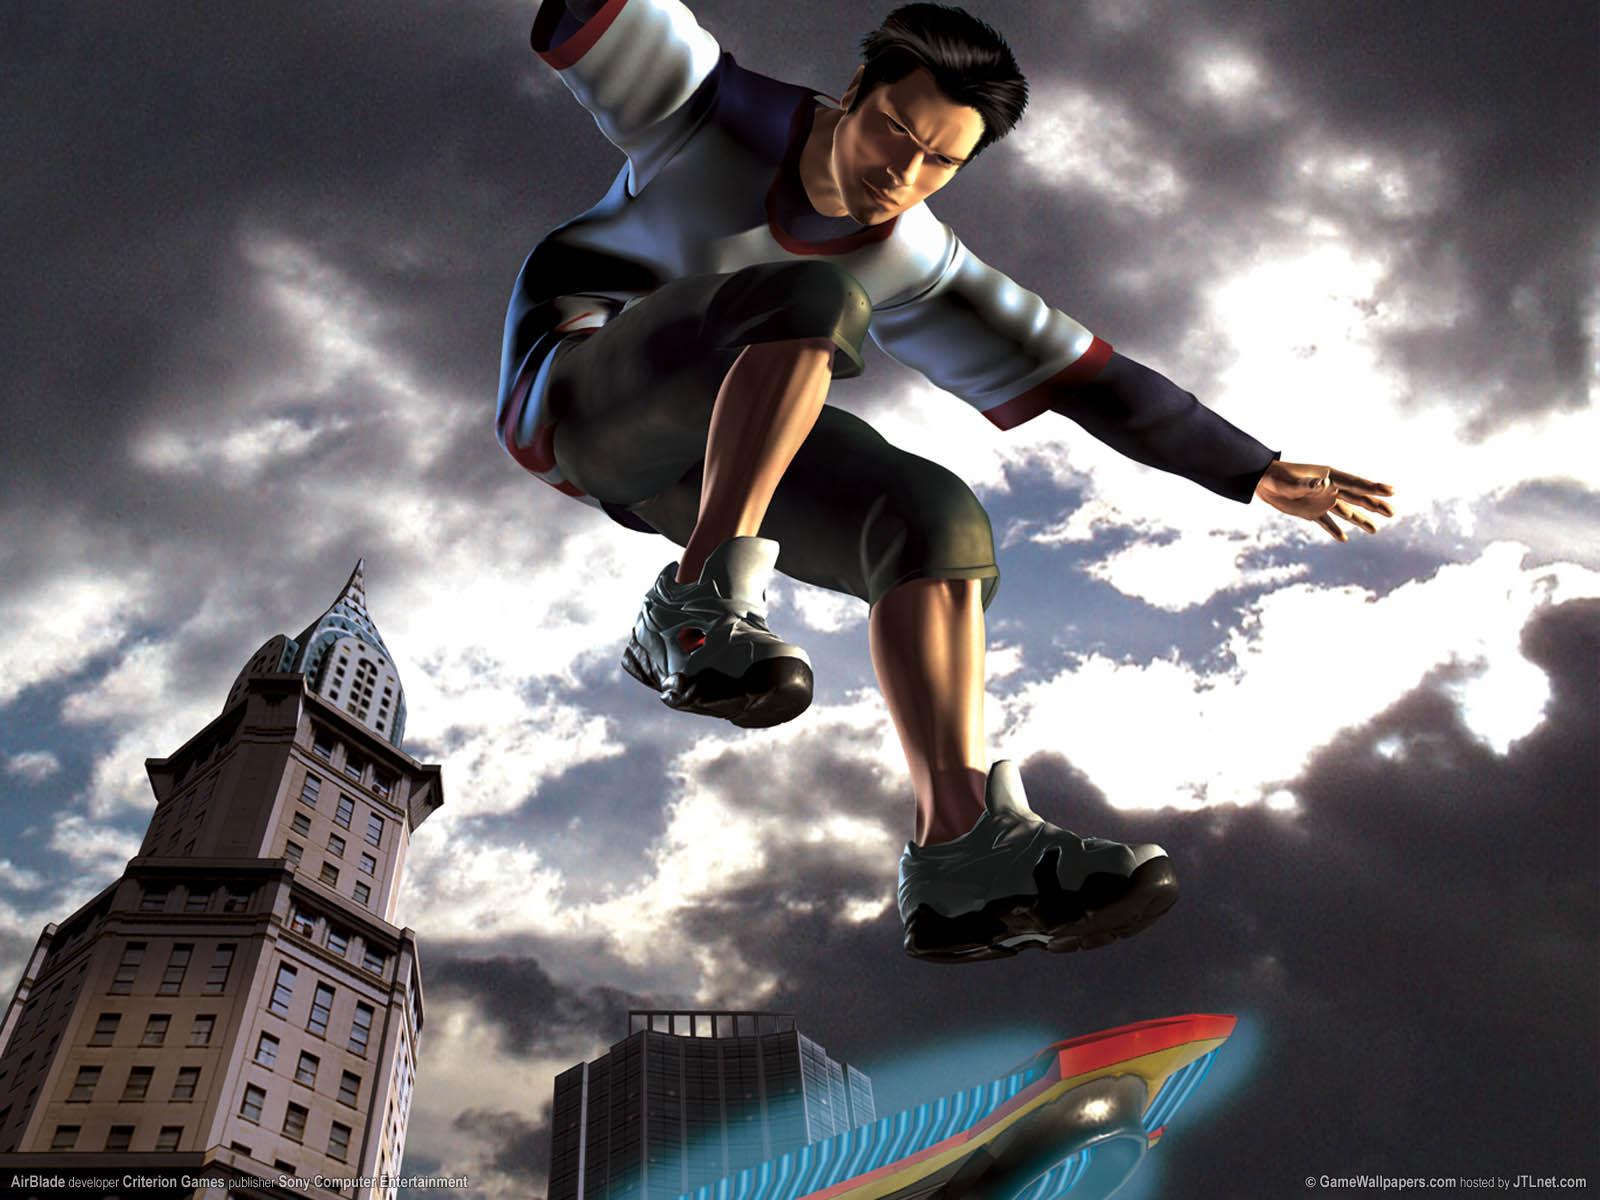 http://2.bp.blogspot.com/-_Y7f58gHH1Q/Thbnd4u_-hI/AAAAAAAAAGw/1IuInT1yIWU/s1600/AirBlade%252C_PlayStation_2_Game.jpg